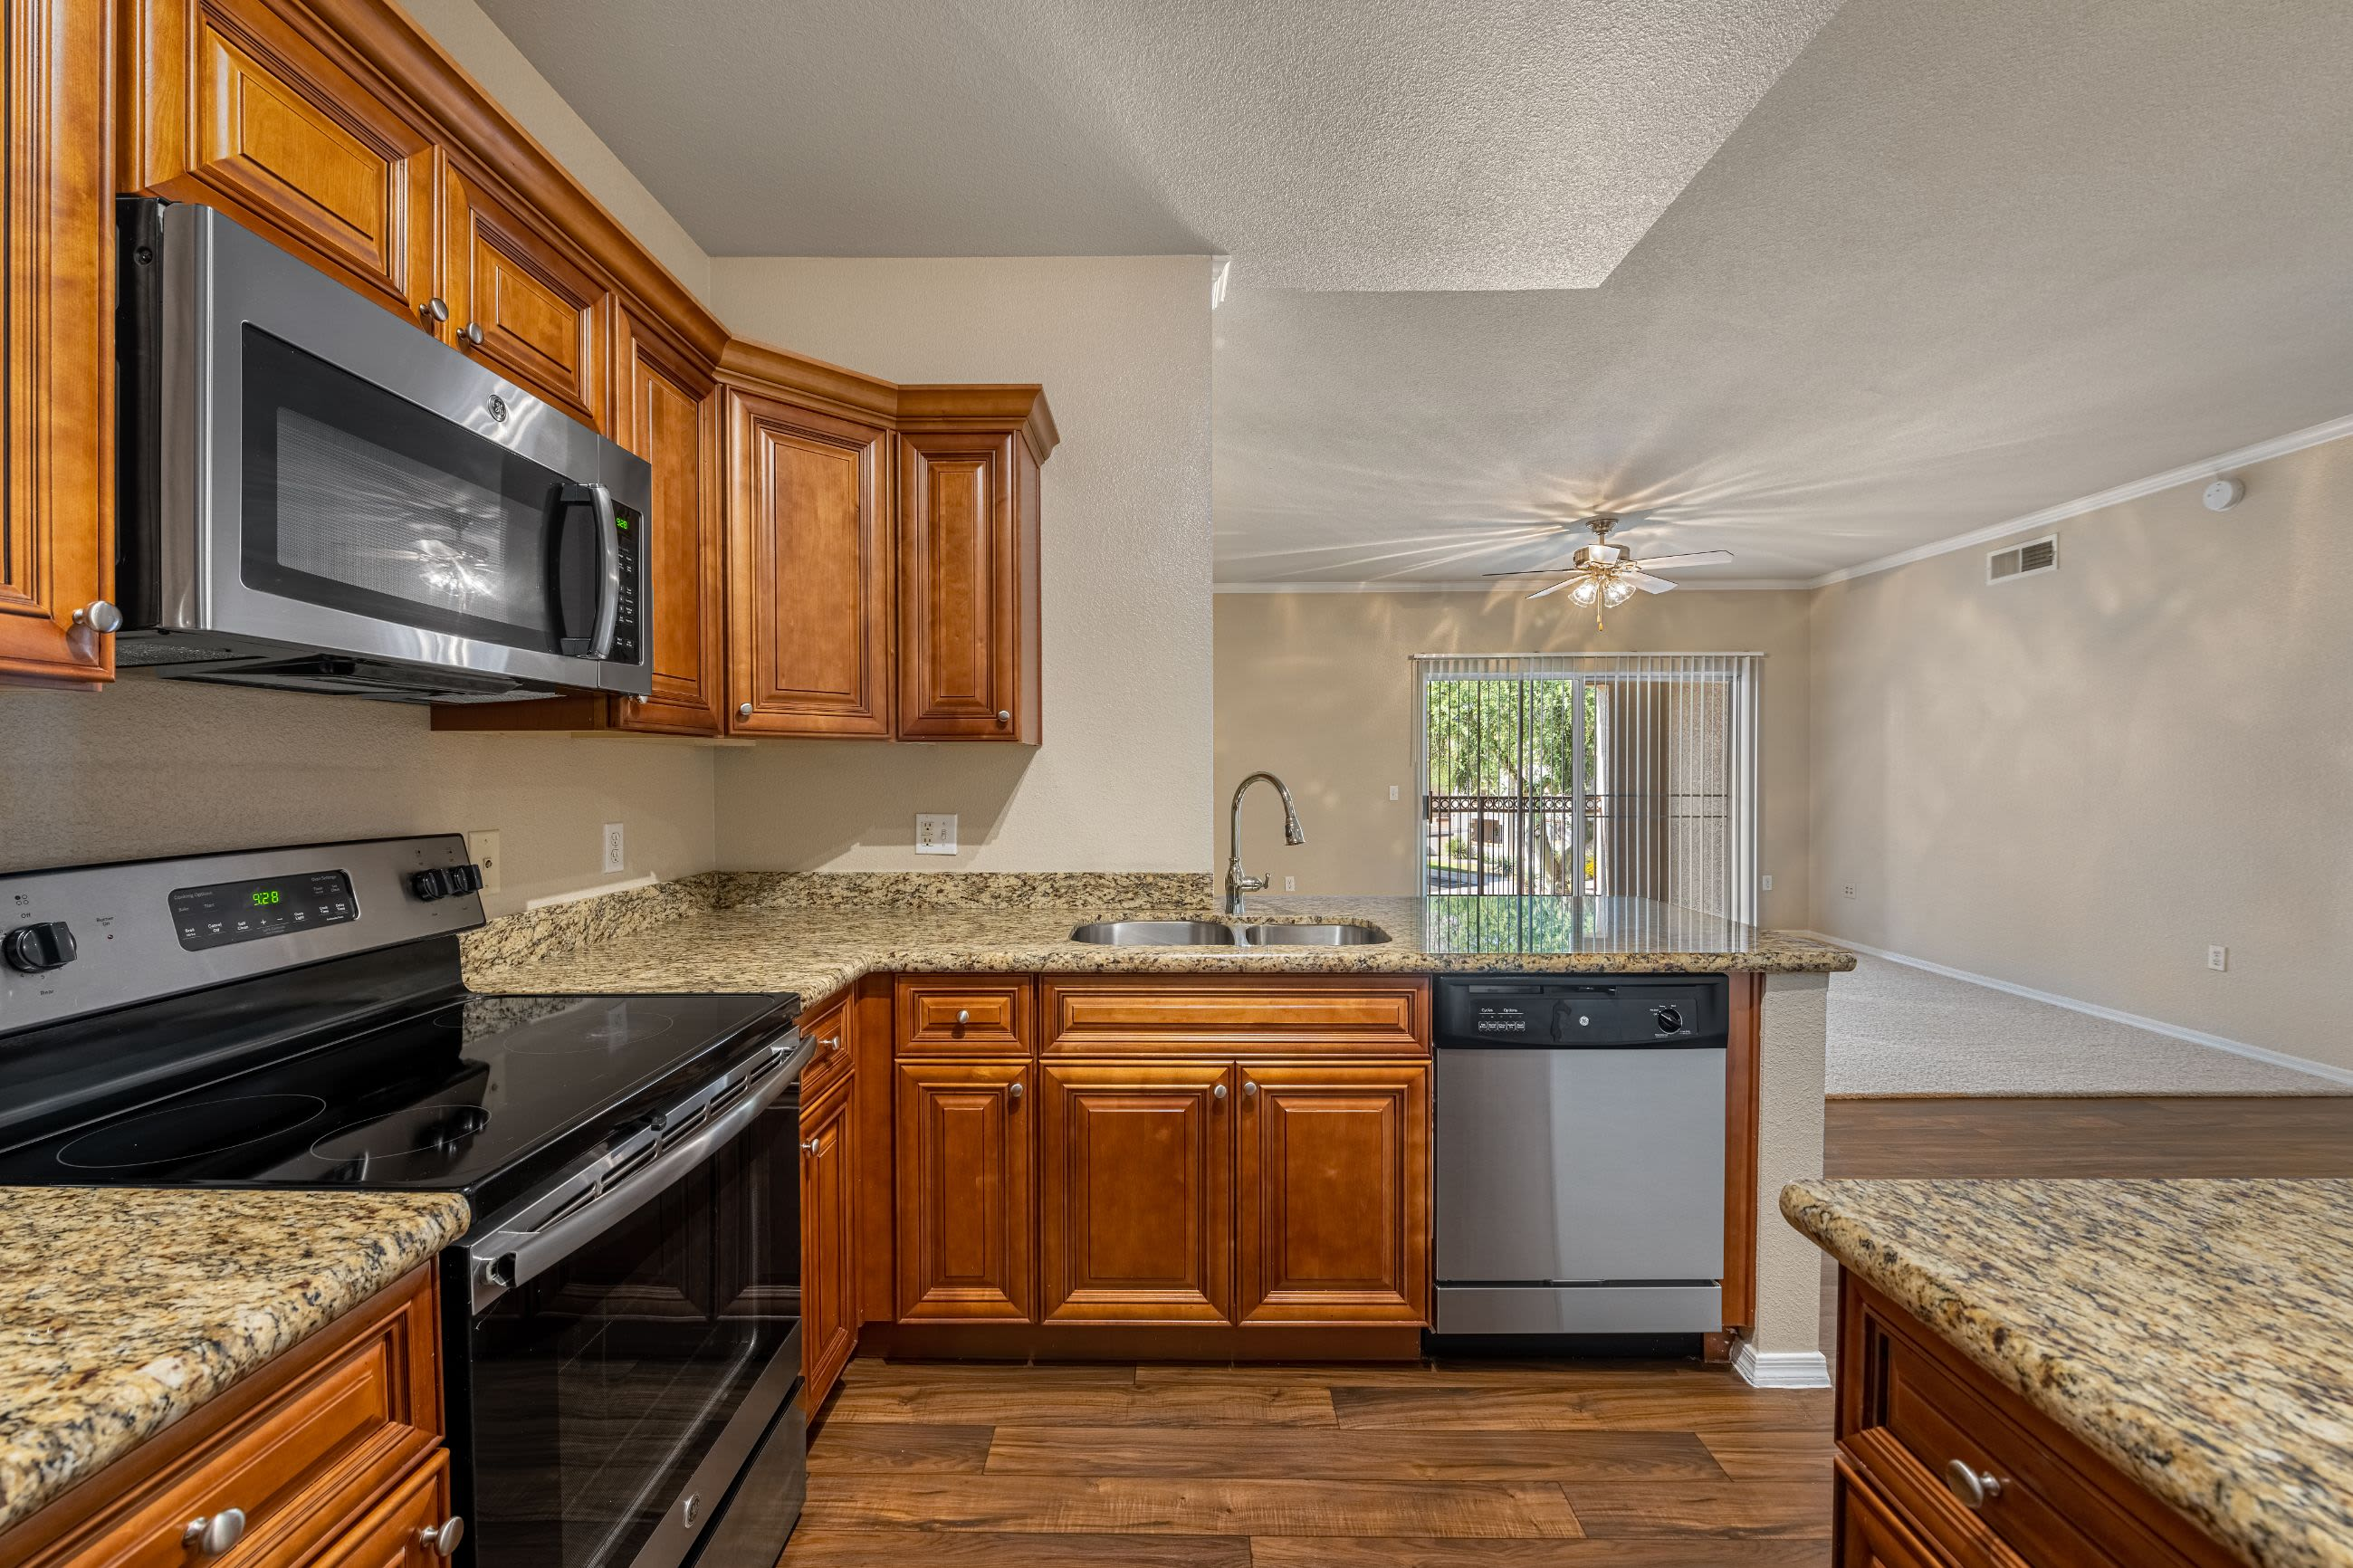 Modern kitchen with wood style floors Azure Creek in Cave Creek, Arizona